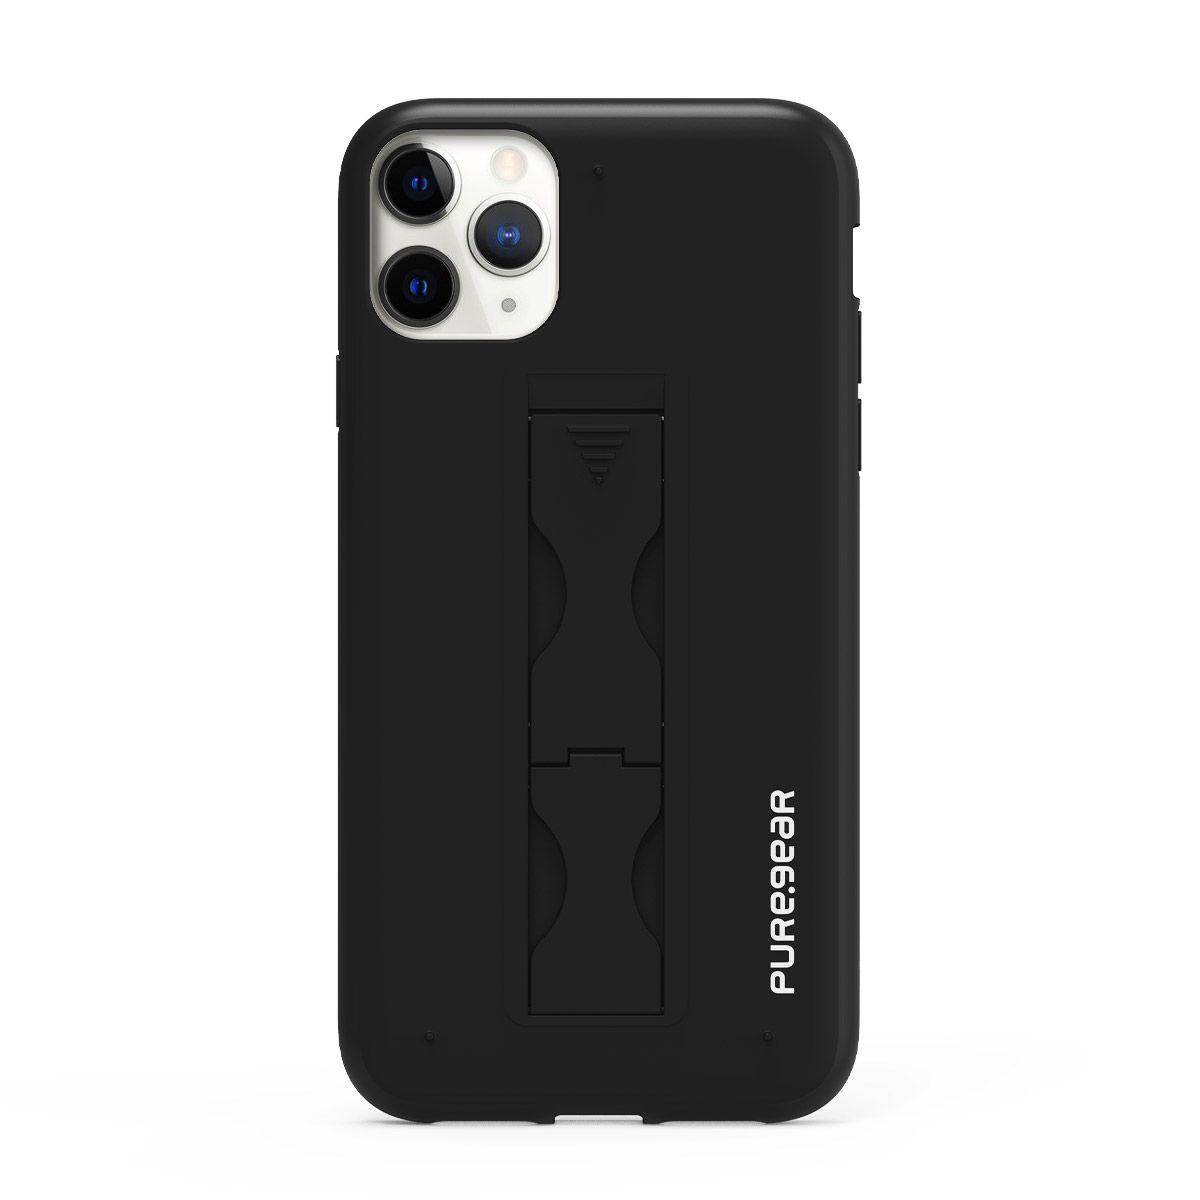 Apple iPhone 11 Pro Max SlimStik, Antimicrobial Kickstand Case – Nightfall